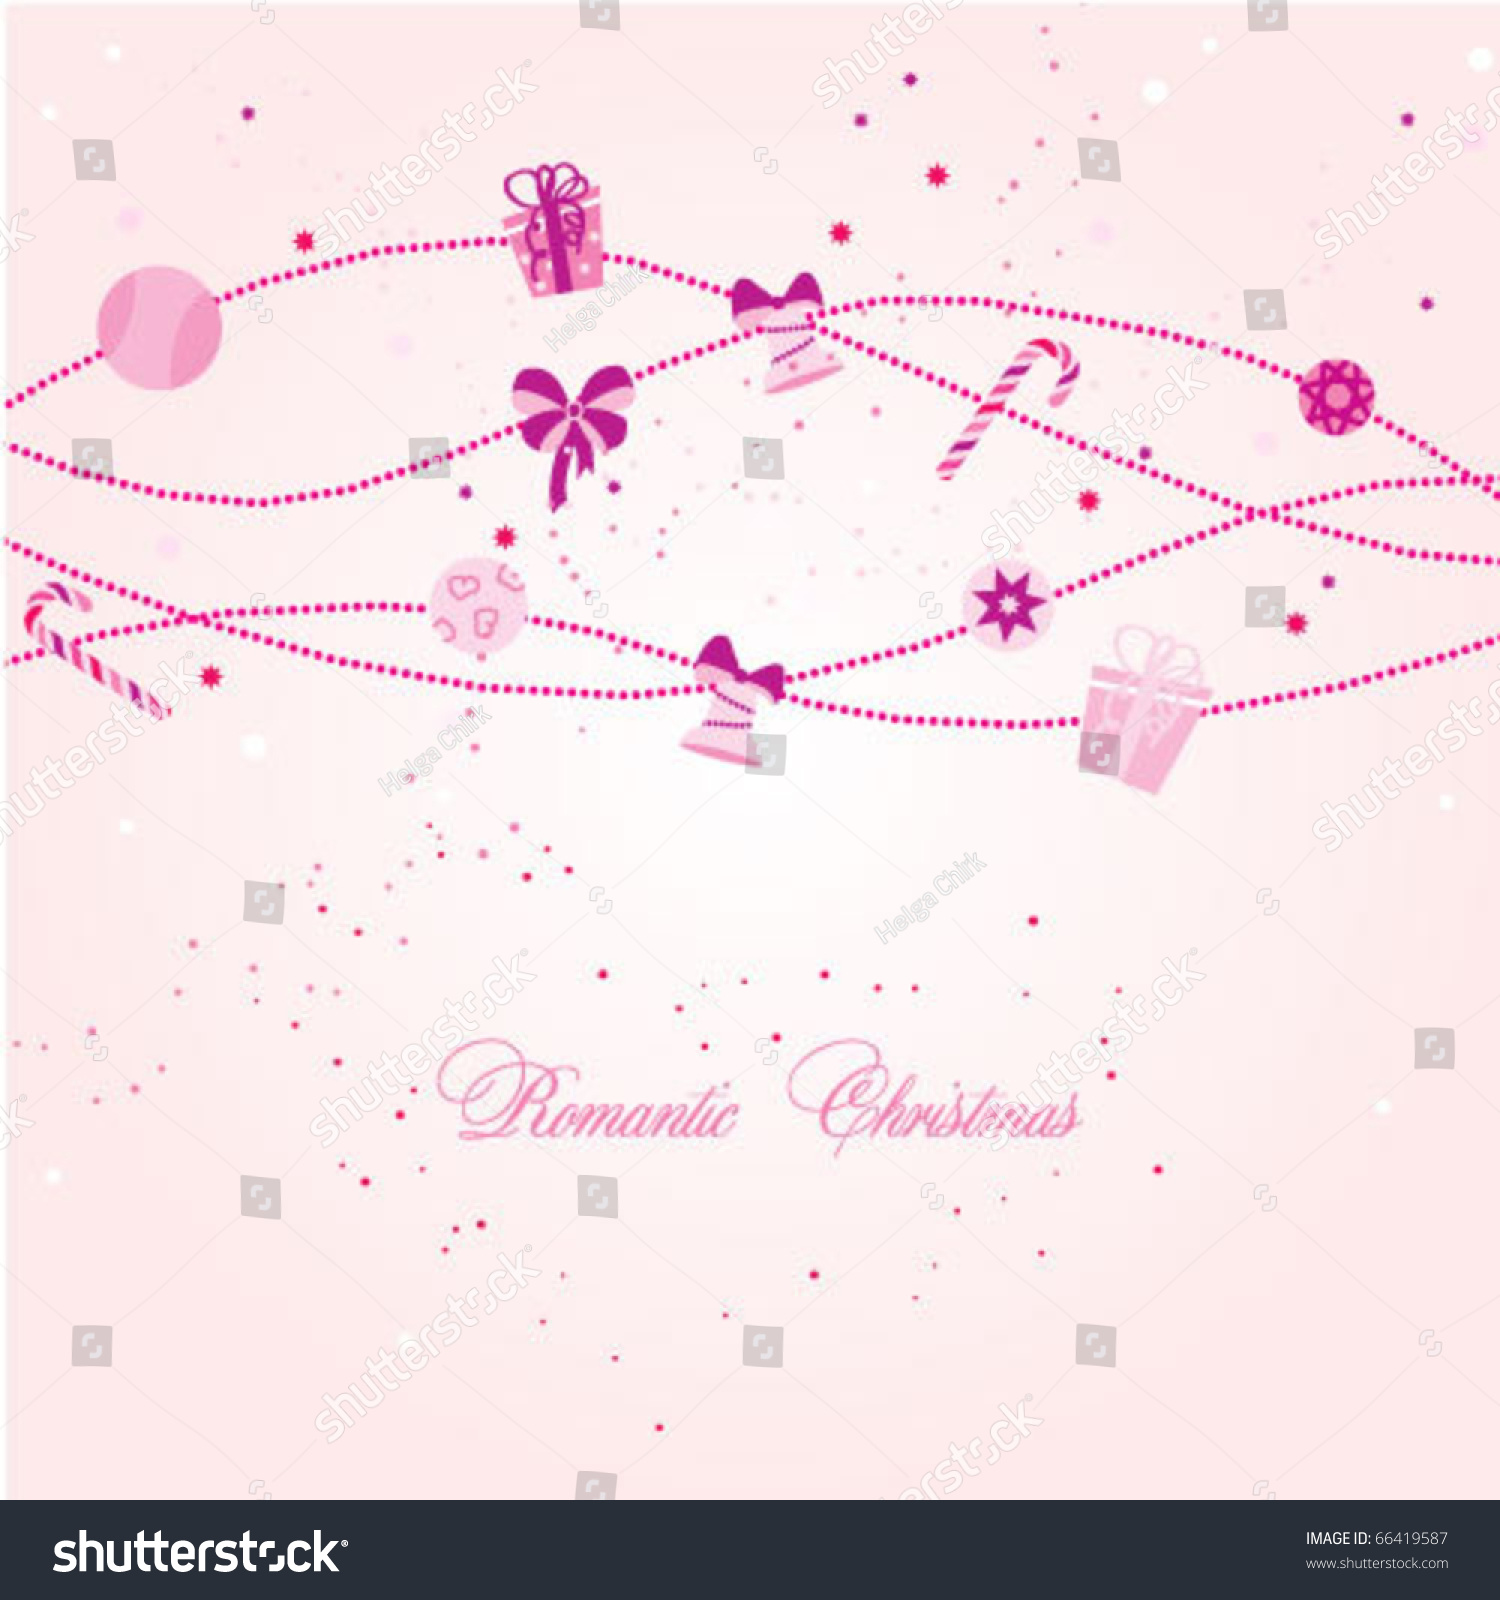 Romantic Christmas Card Stock Vector (Royalty Free) 66419587 ...